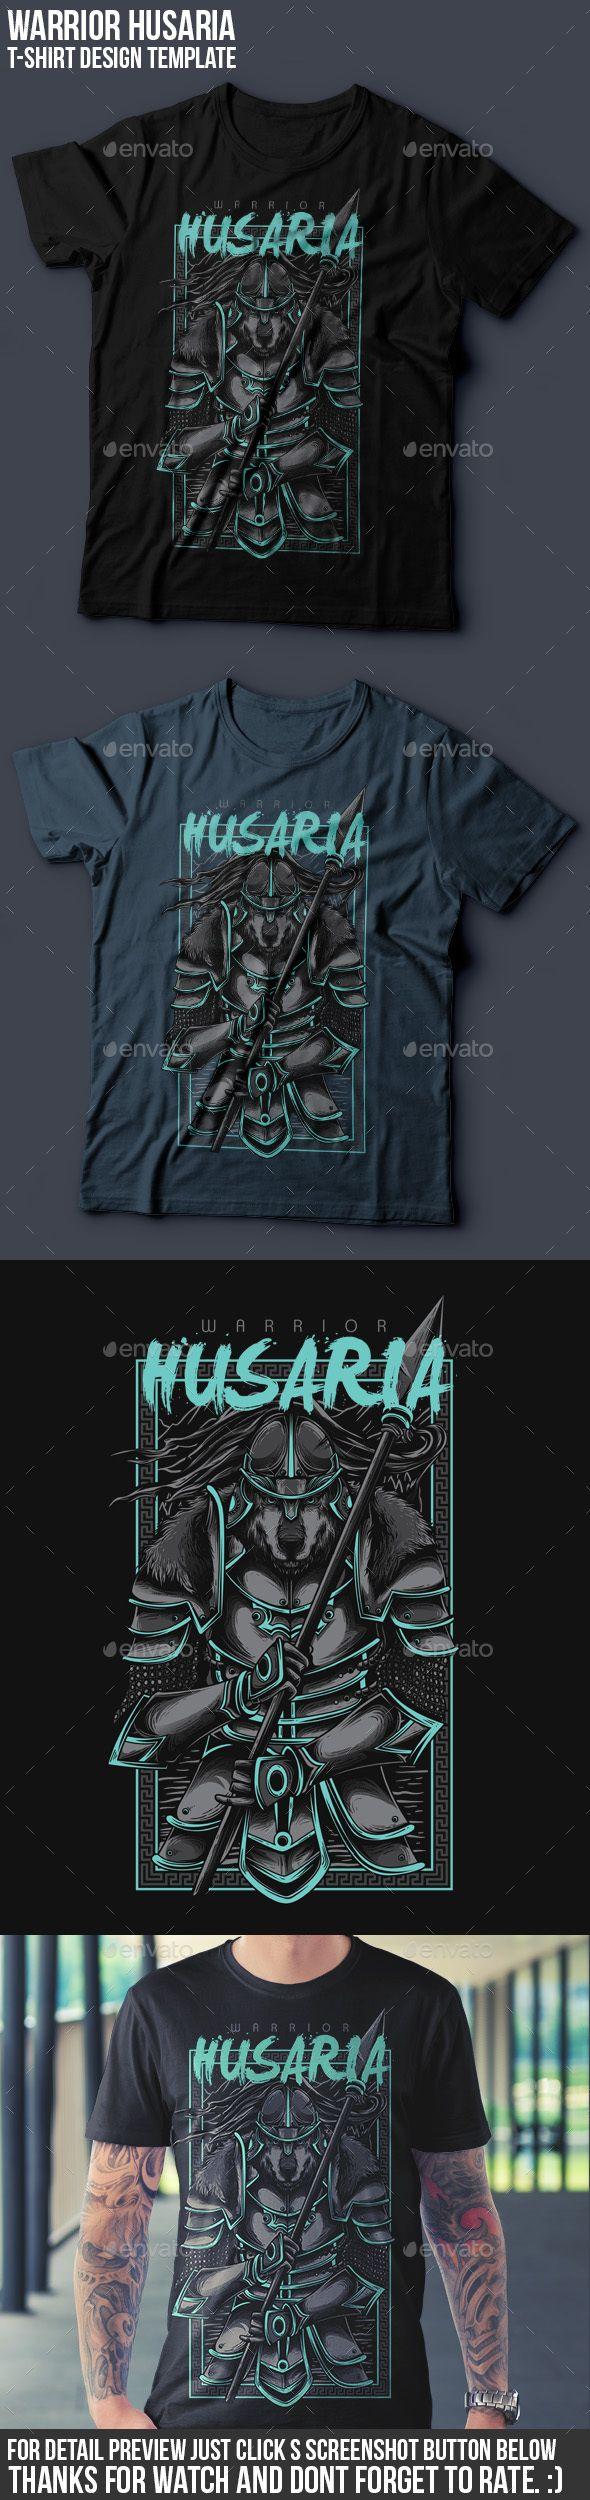 Husaria Warrior T-Shirt Design Vector EPS, Transparent PNG, AI Illustrator. Download here: https://graphicriver.net/item/husaria-warrior-tshirt-design/17240528?ref=ksioks